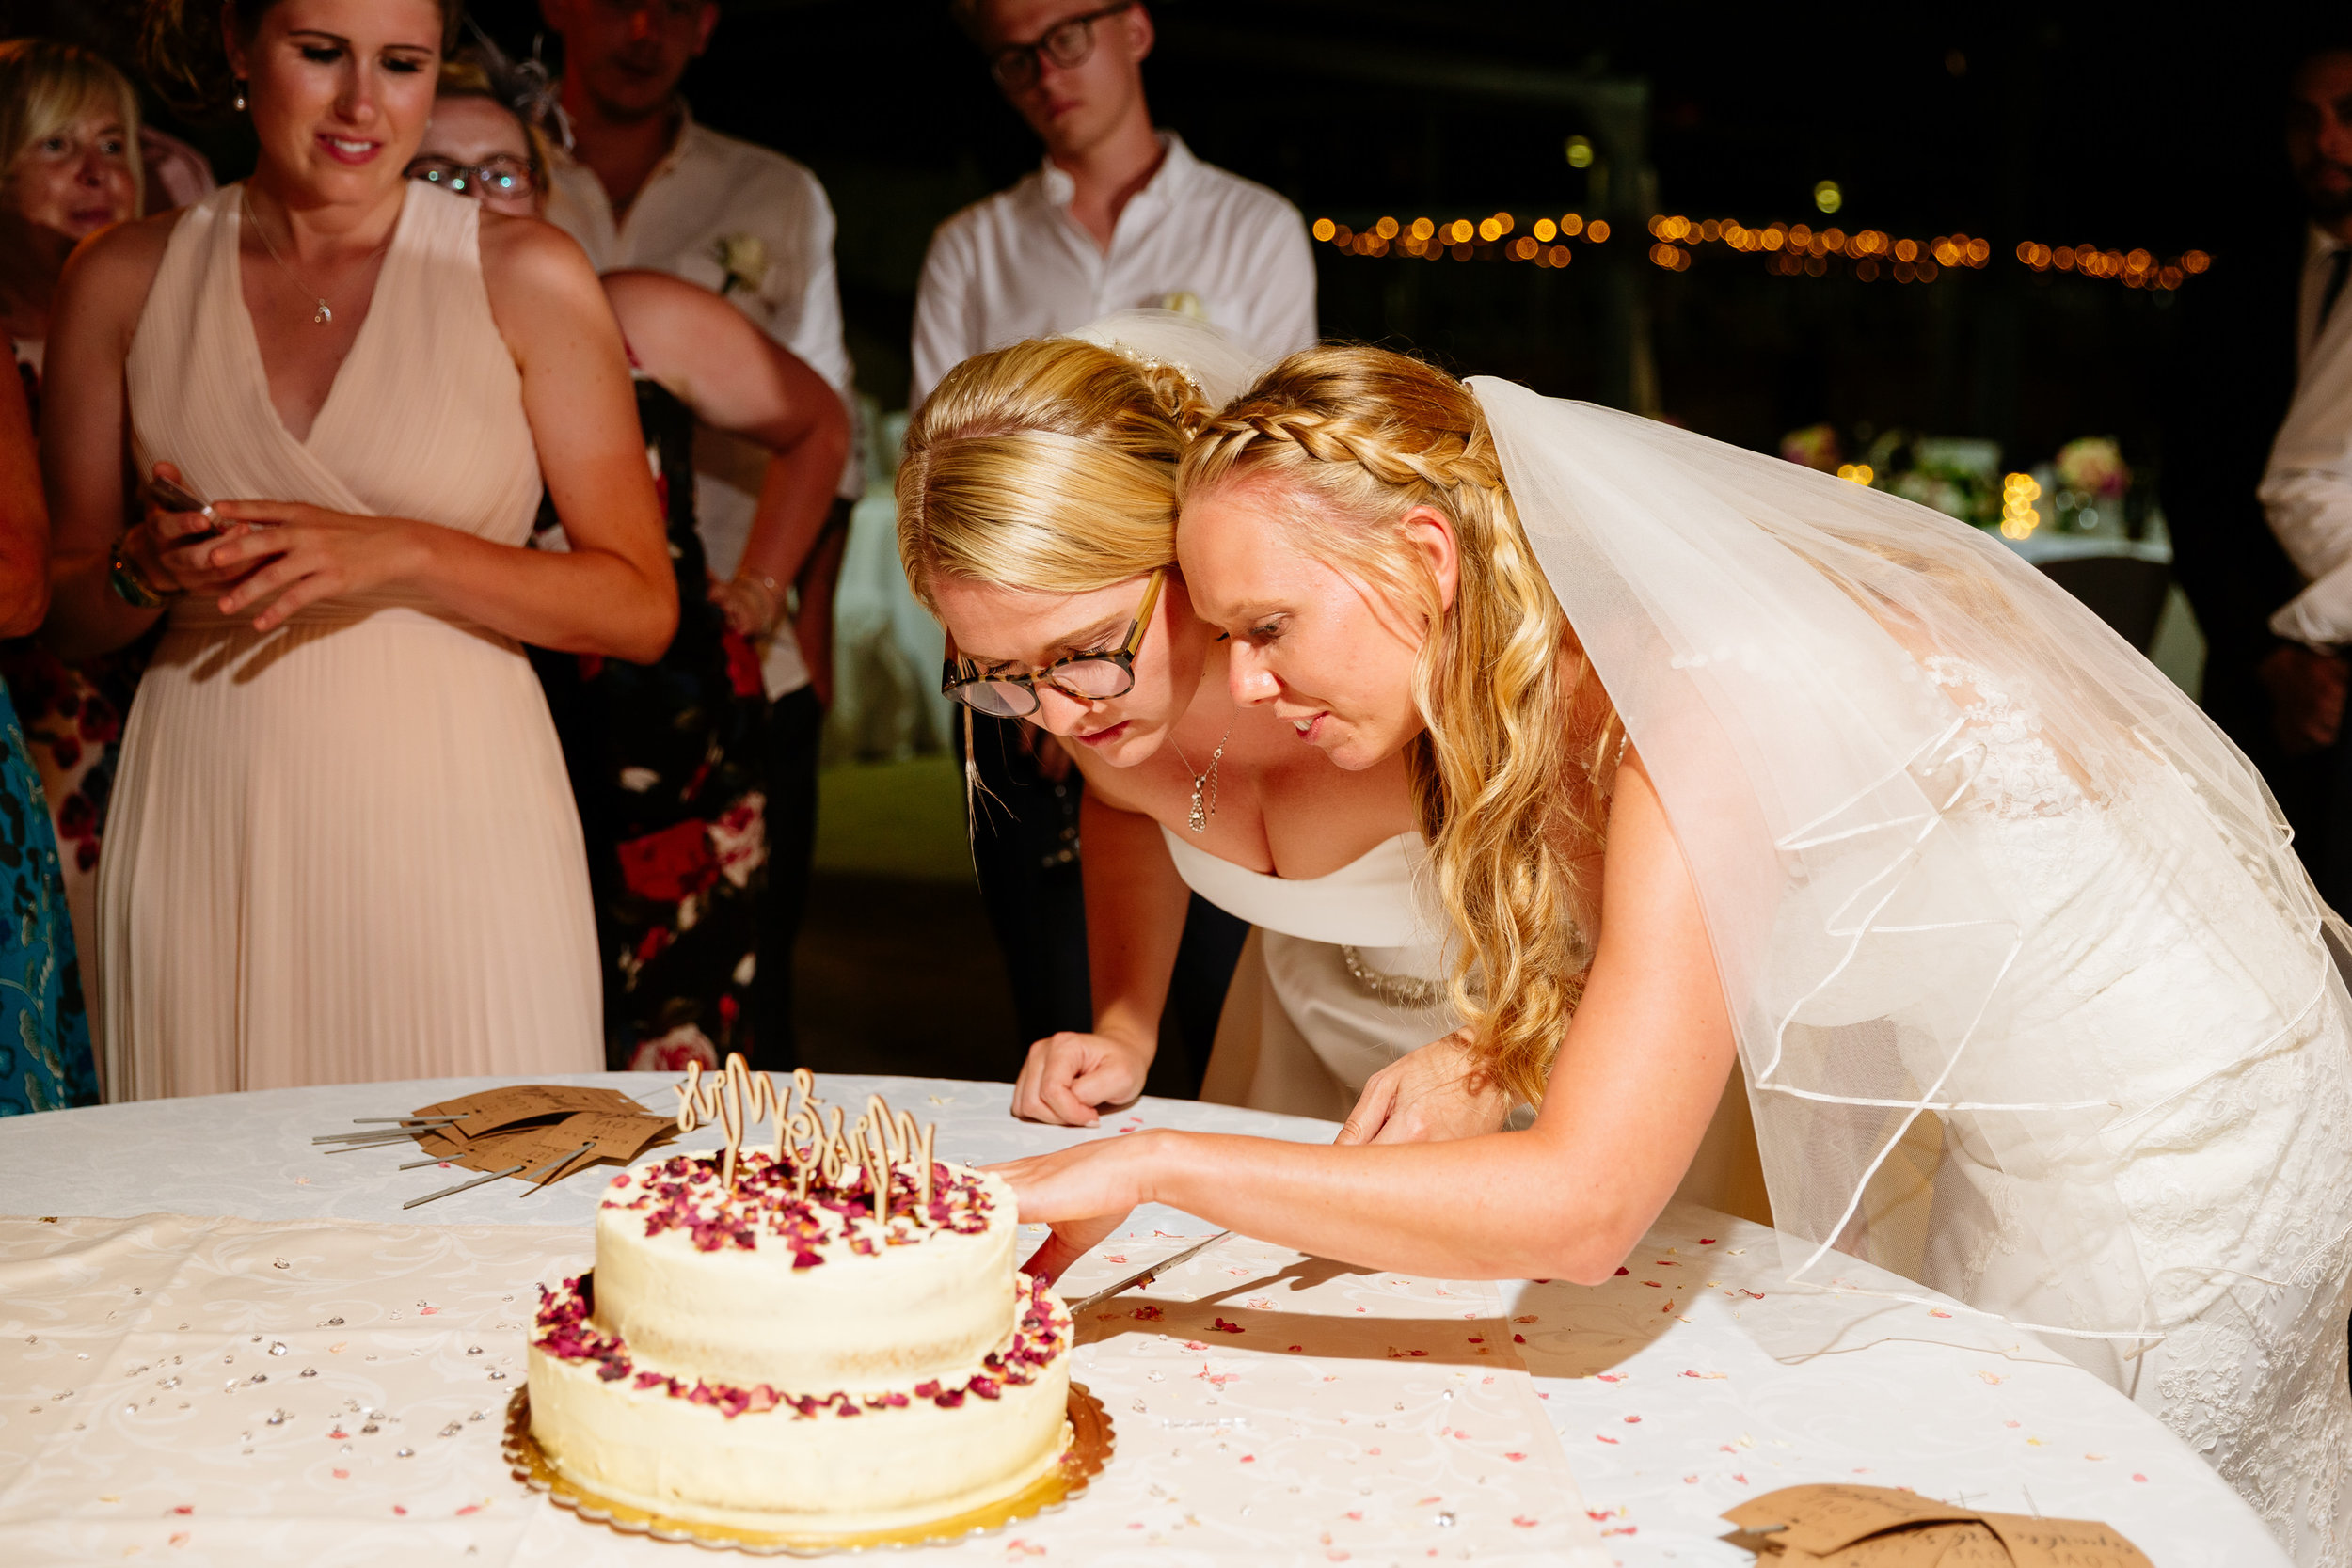 Malta_wedding_photography-99.jpg